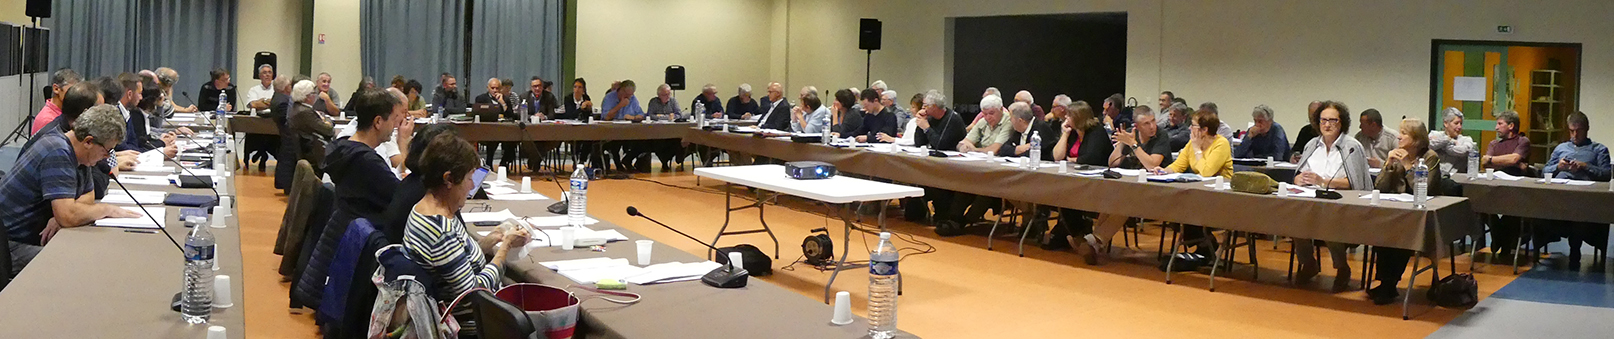 Conseil communautaire panoramique 25 septembre 2017